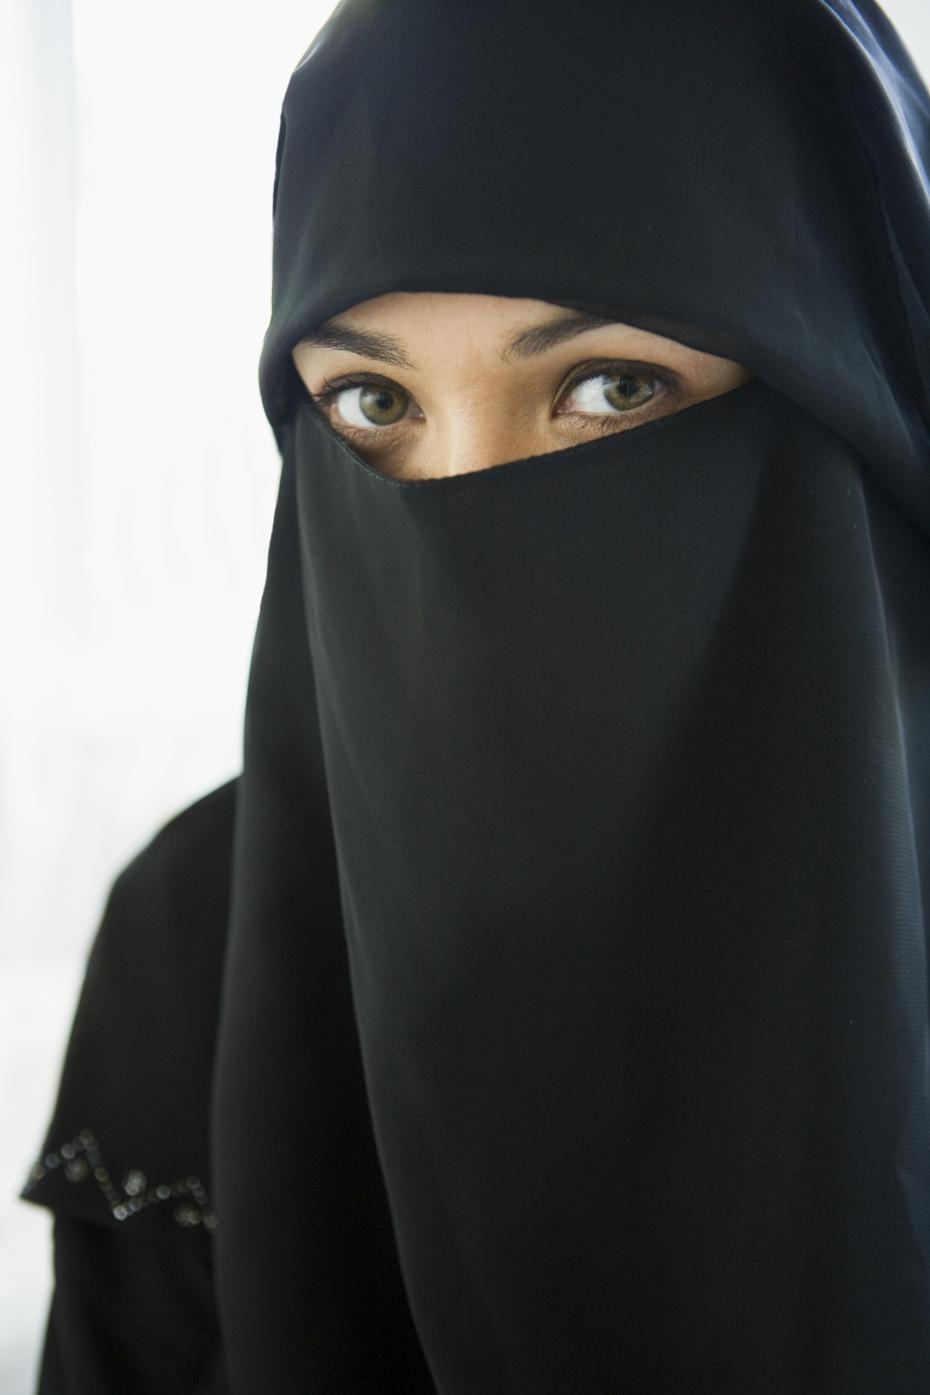 Saudi Females In Full Burkas Niqab Or Burqa Which Show Him The